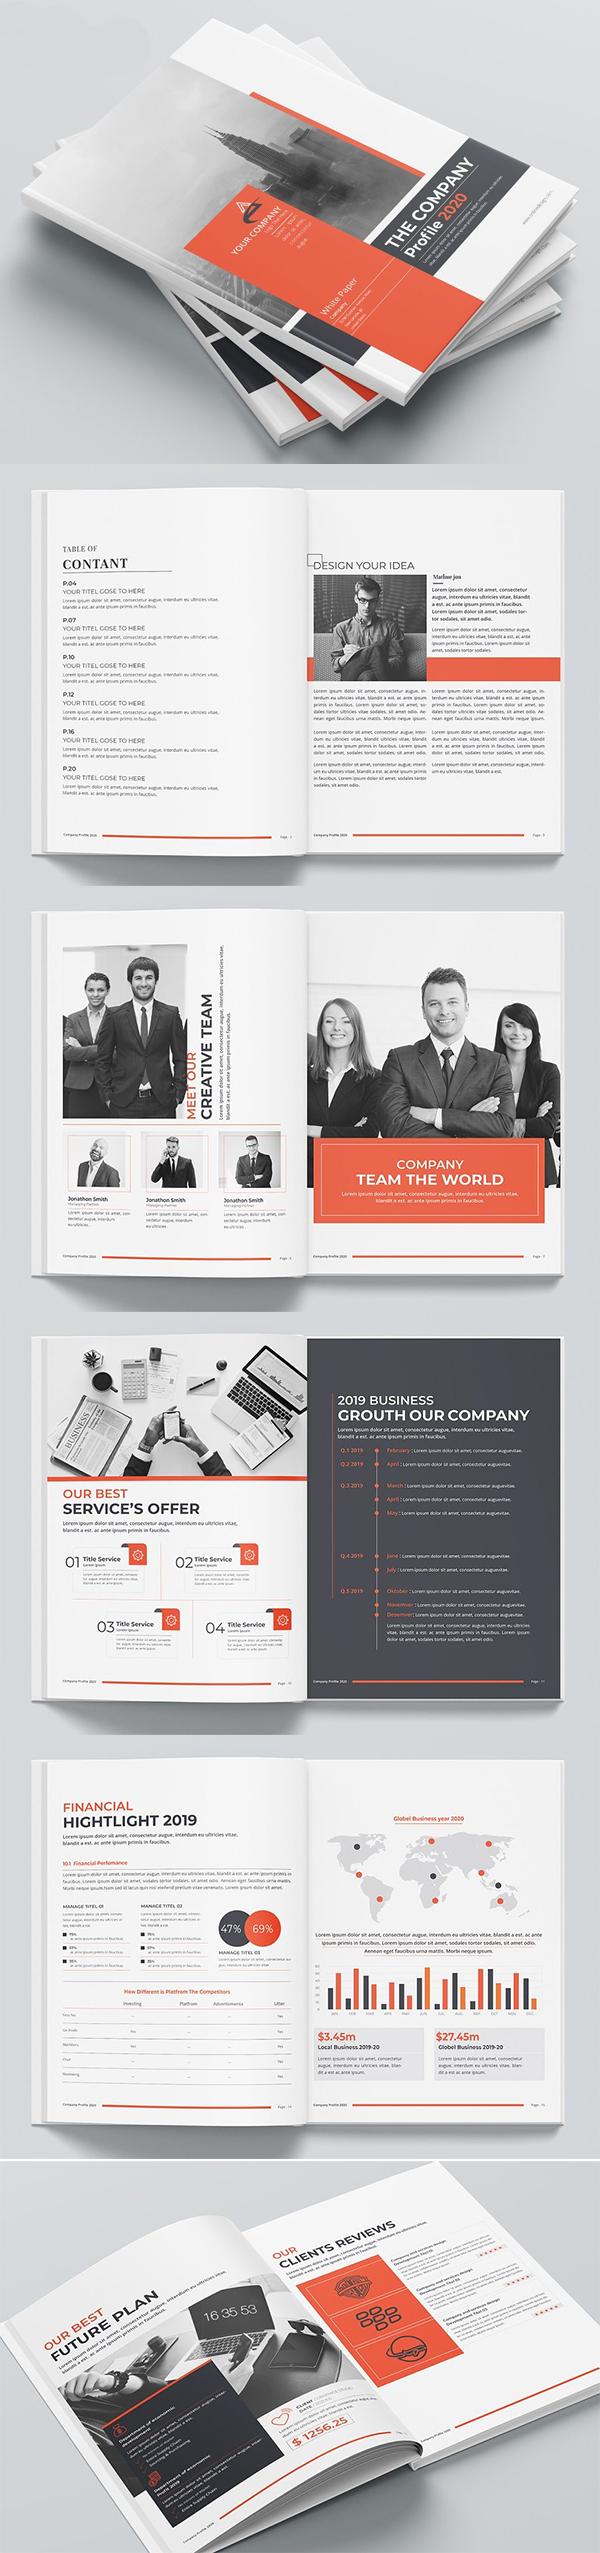 Company Profile Word Template